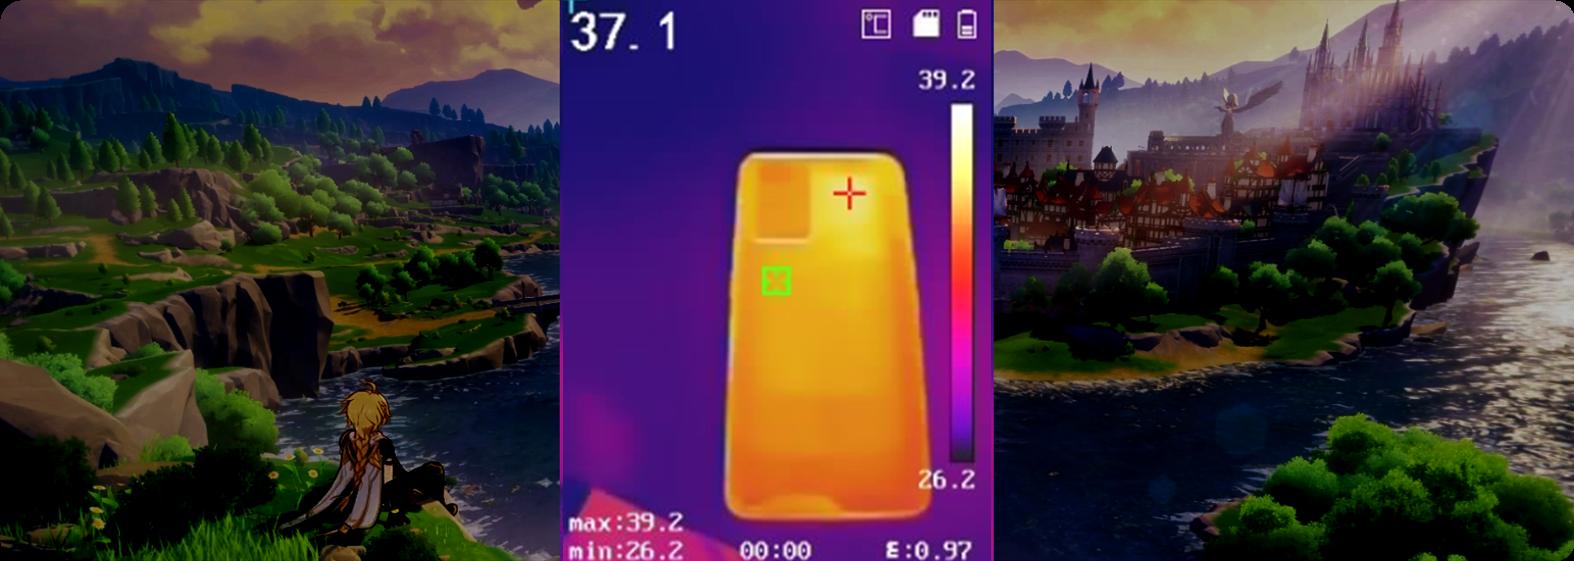 realme GT Neo2评测:2399元够诚意 骁龙870水桶机